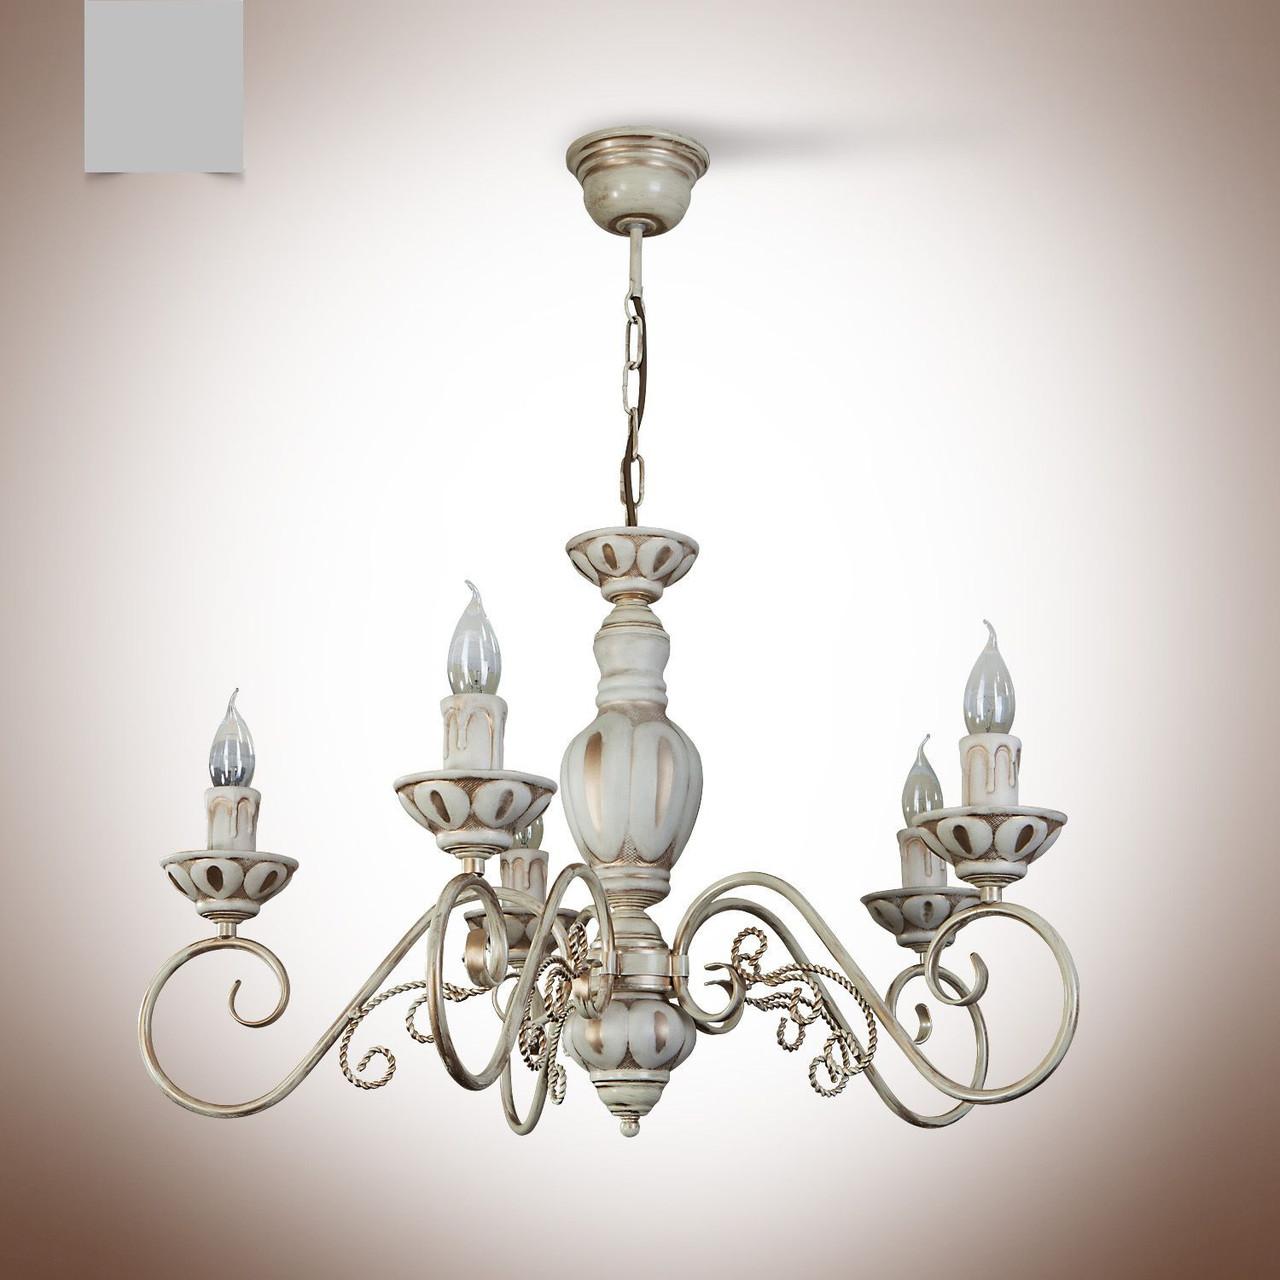 Люстра 5 ламповая для зала, спальни, кабинета  19005